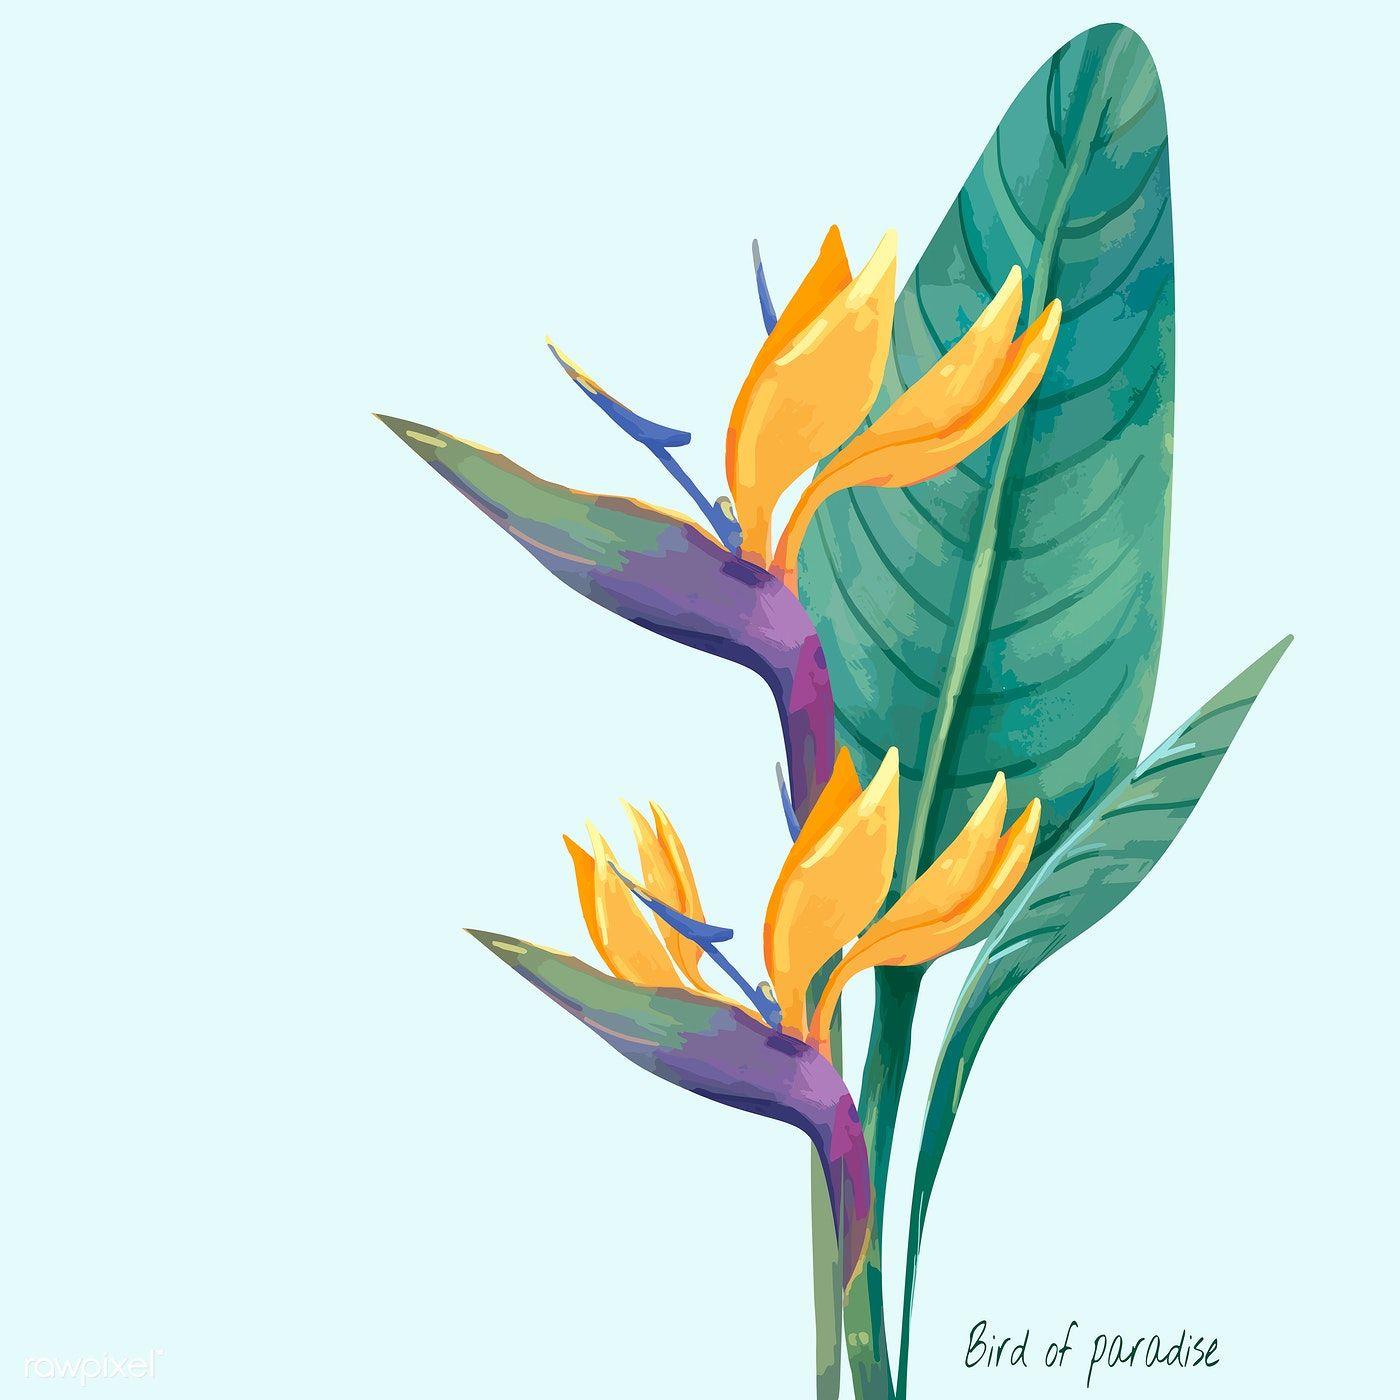 Hand Drawn Bird Of Paradise Flower Premium Image By Rawpixel Com Birds Of Paradise Flower Birds Of Paradise Plant Birds Of Paradise